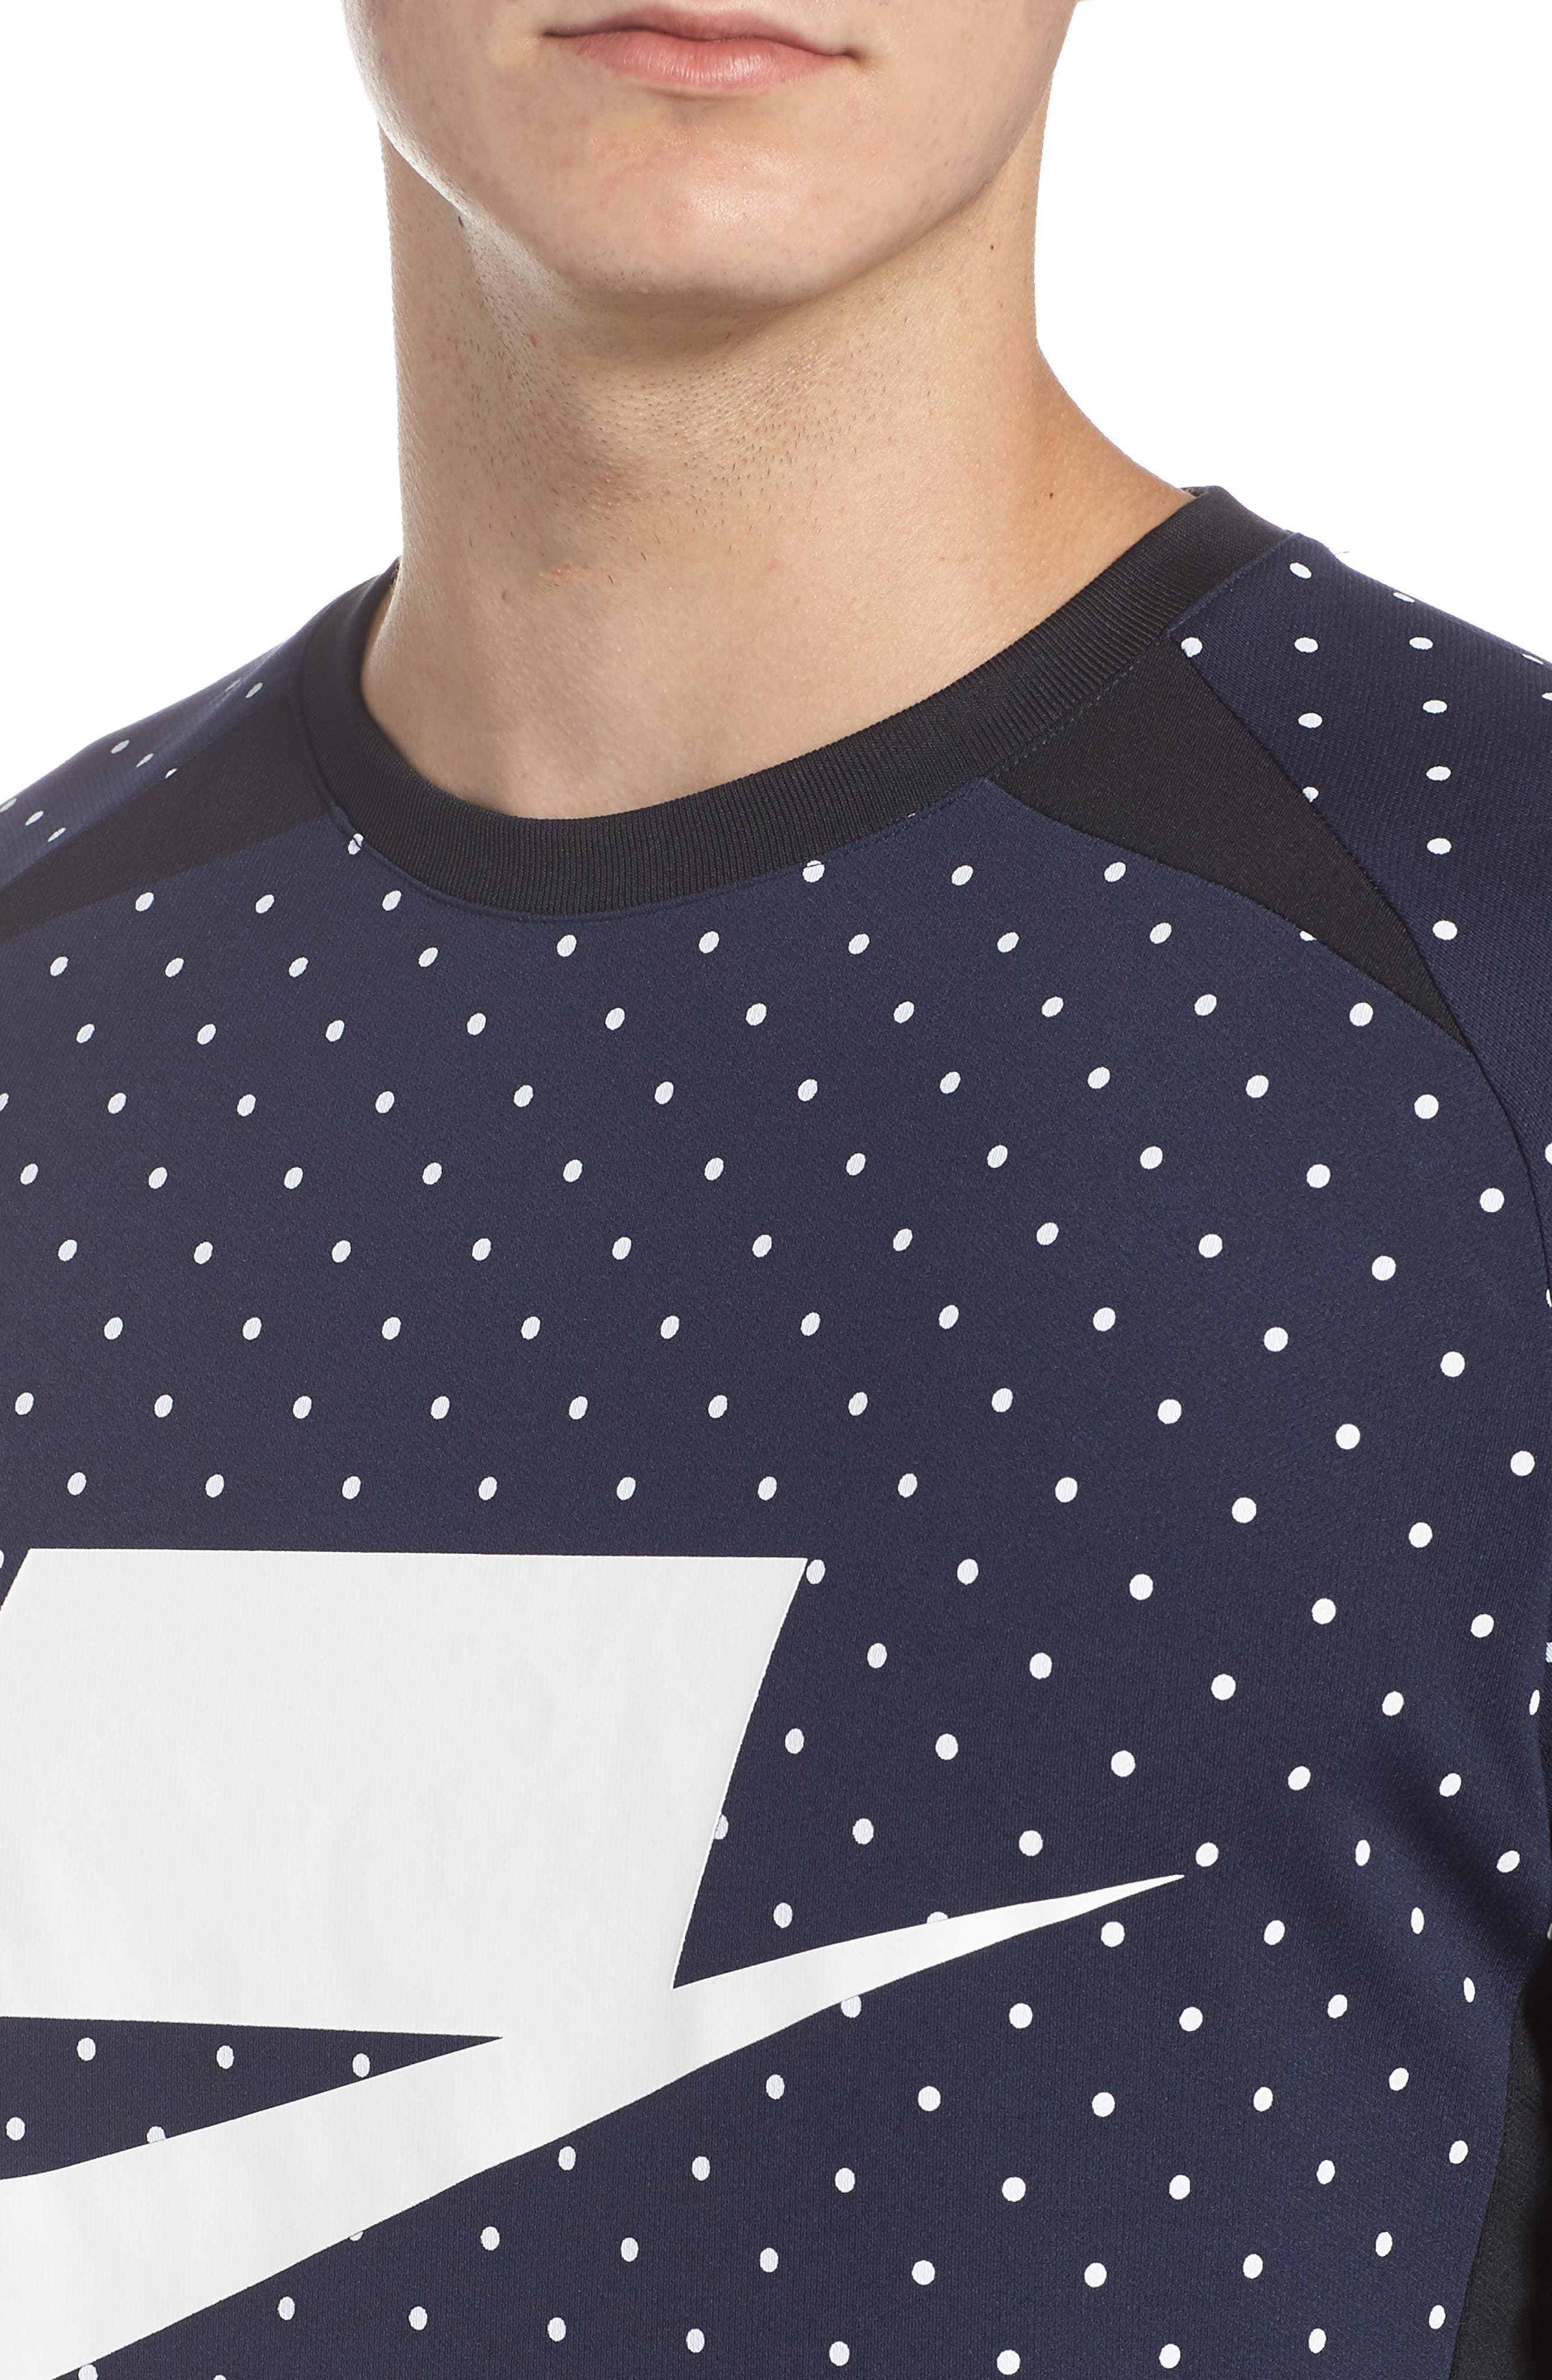 NSW Long Sleeve Shirt,                             Alternate thumbnail 4, color,                             451